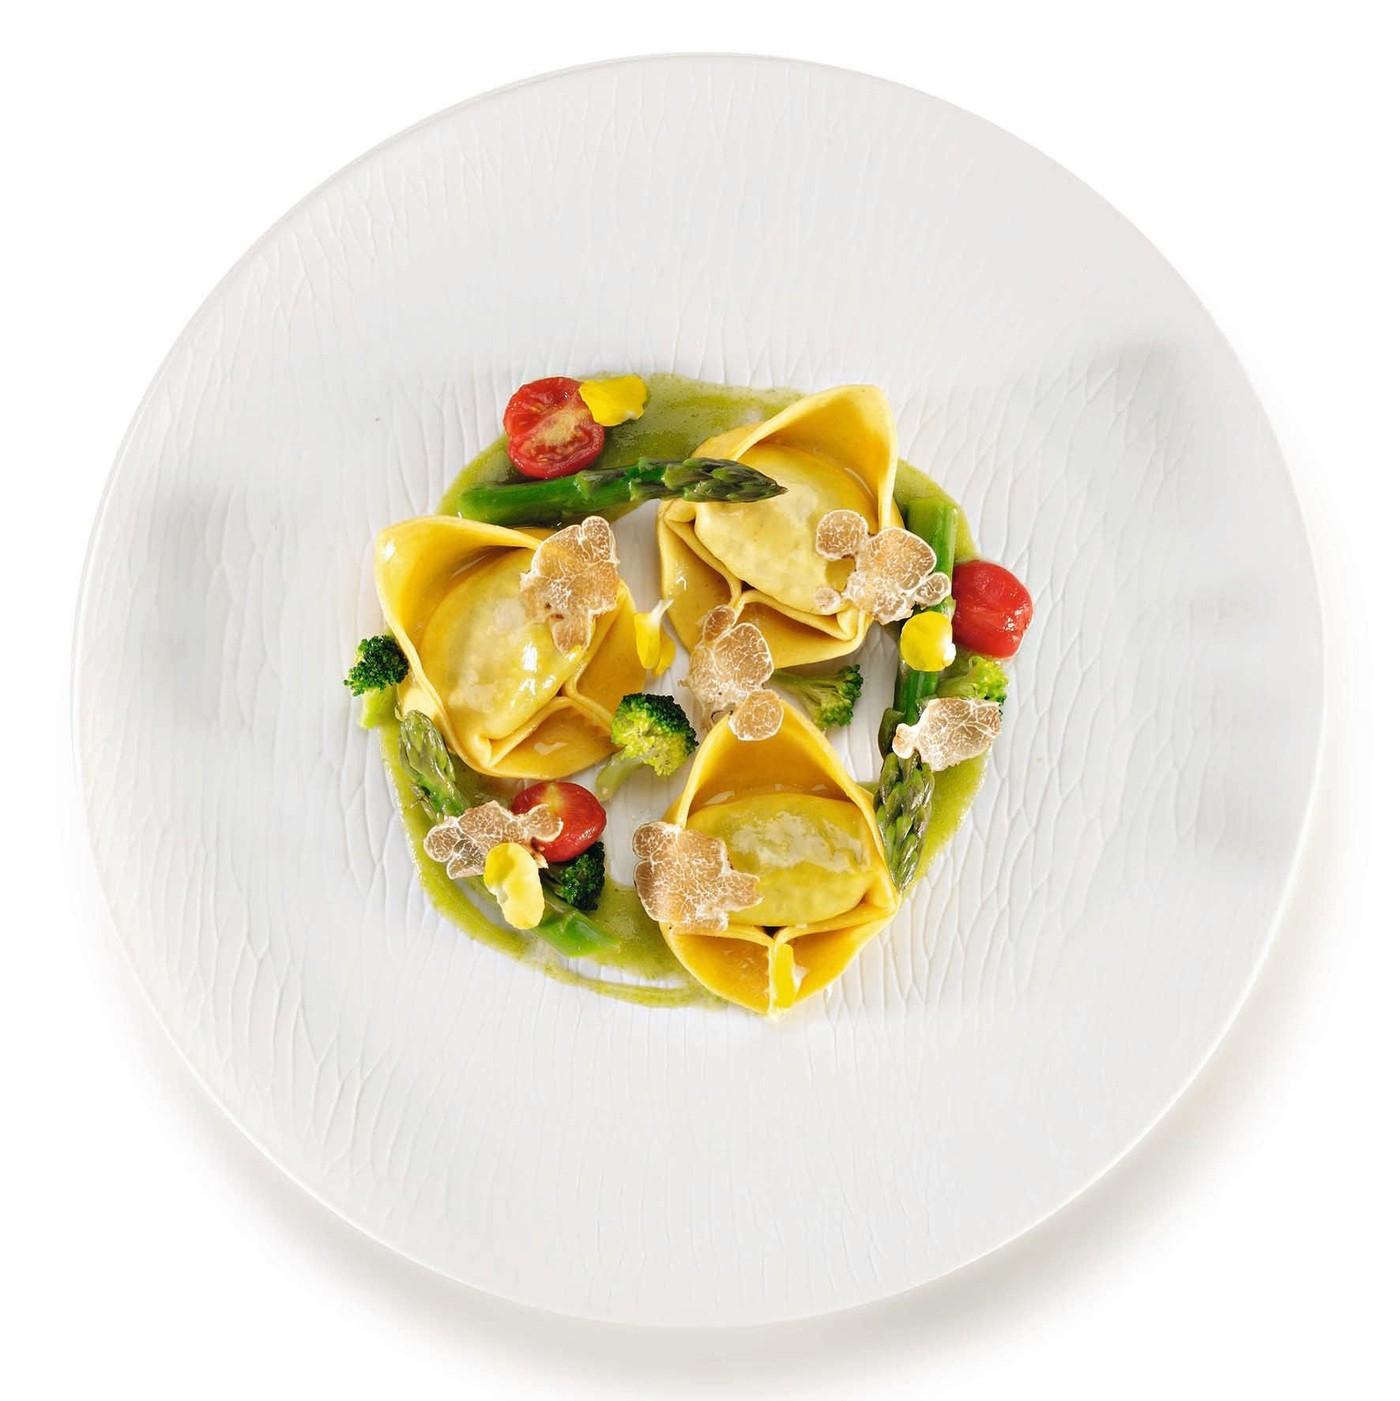 receta de Giganti con ricotta y verduras